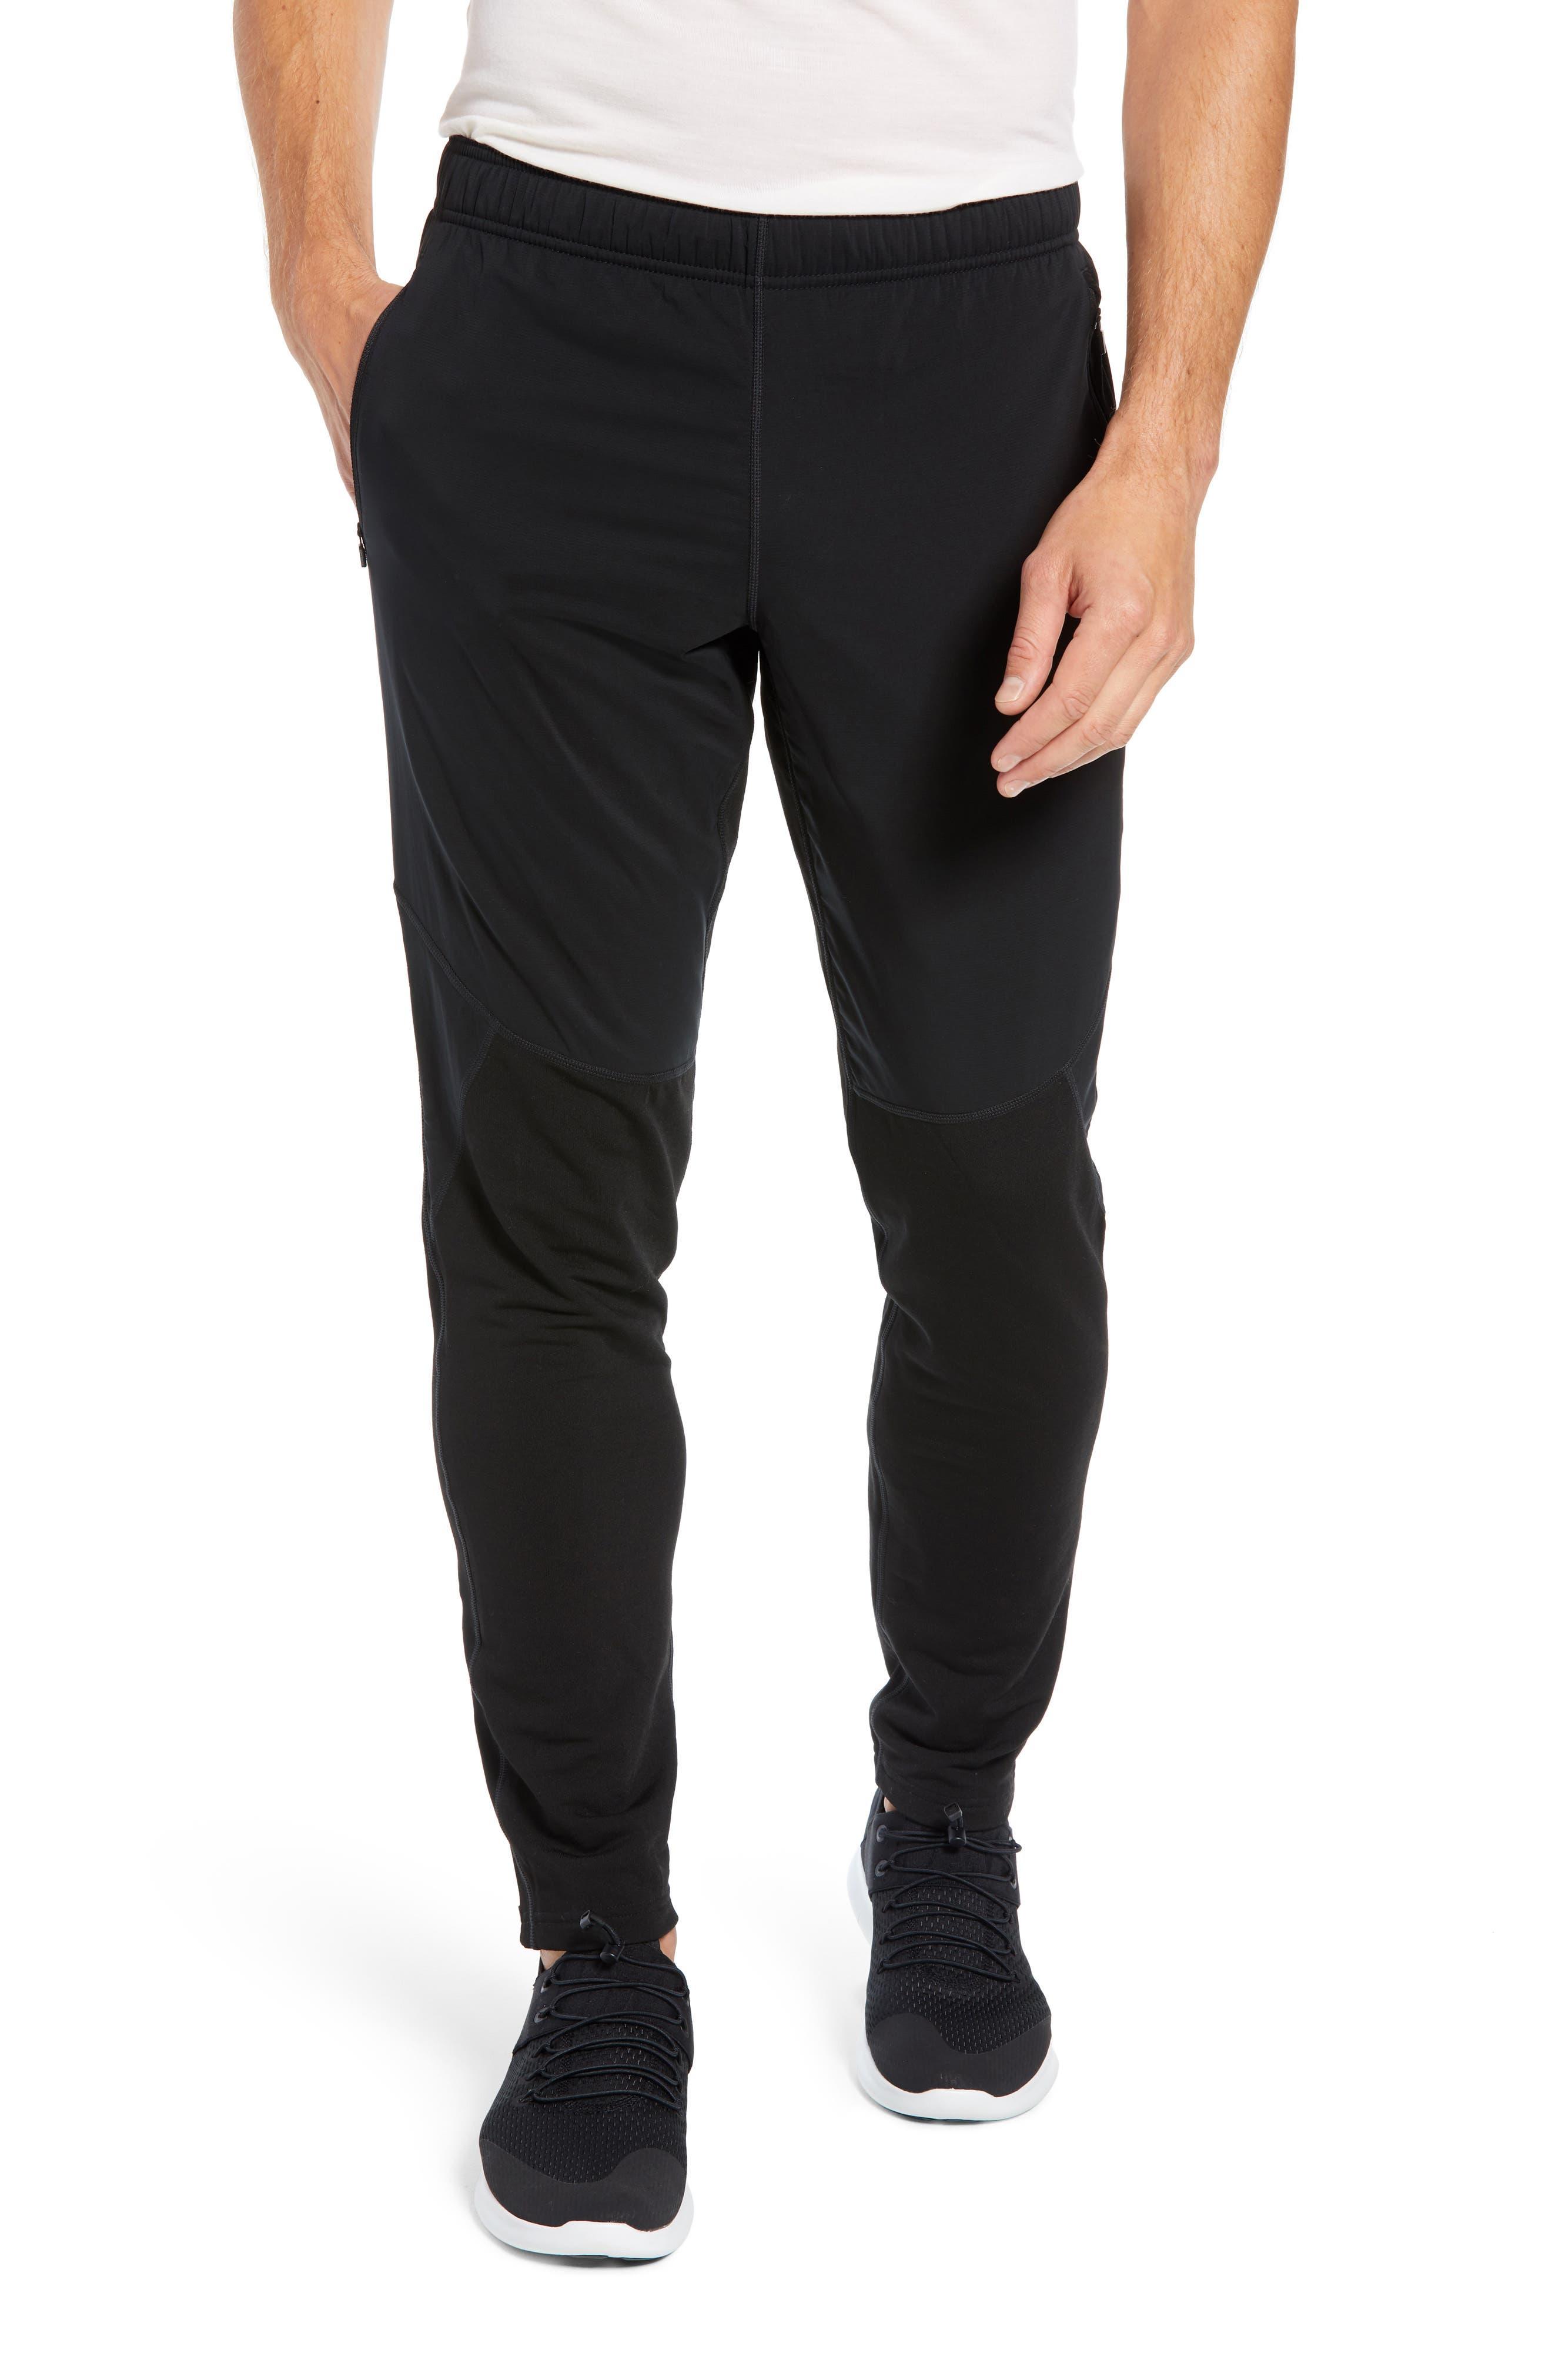 Tech Trainer Hybrid Sport Pants,                             Main thumbnail 1, color,                             BLACK